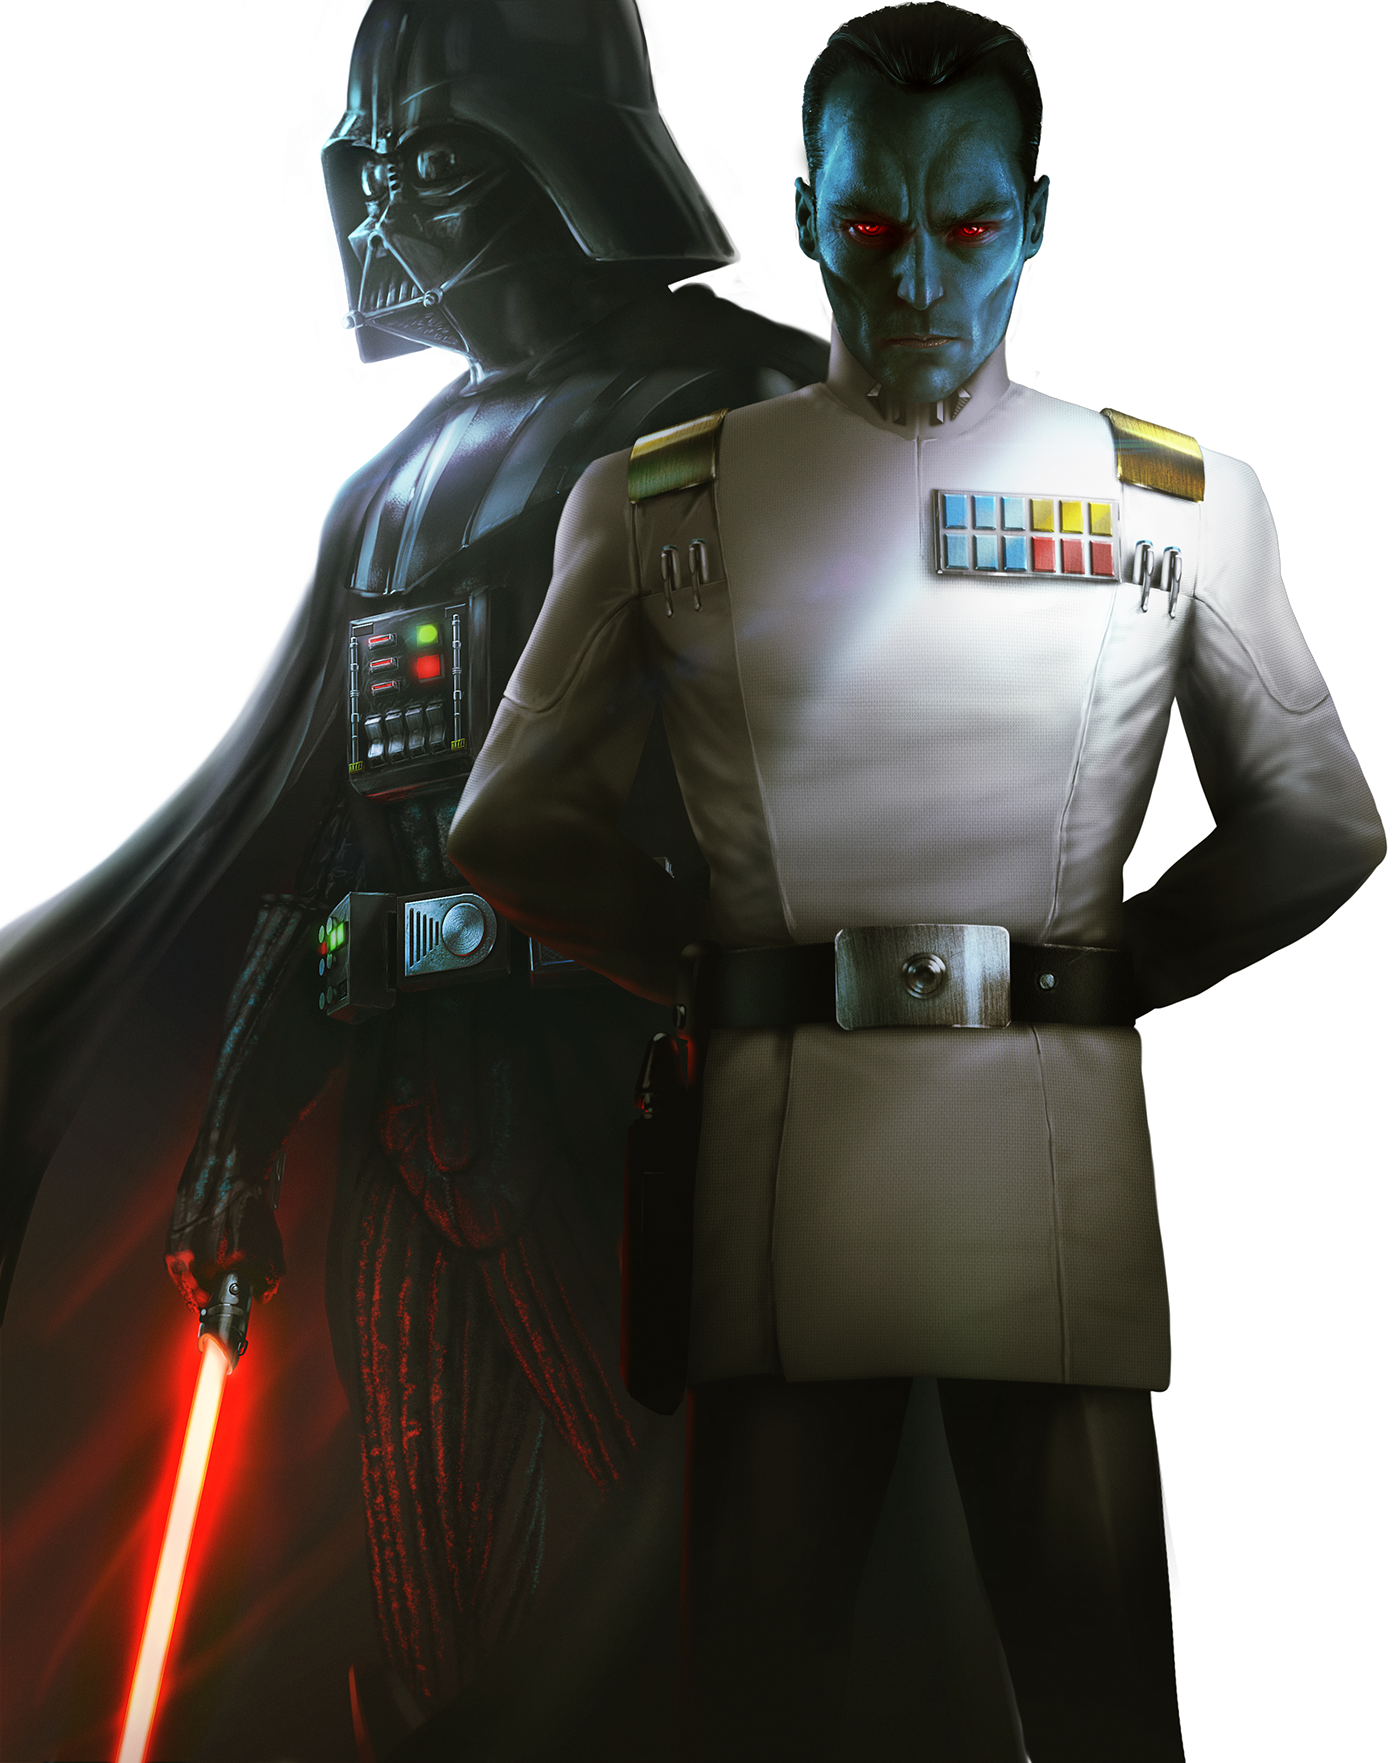 Star Wars Thrawn Alliances Official On Behance Star Wars Pictures Star Wars Images Star Wars Fandom